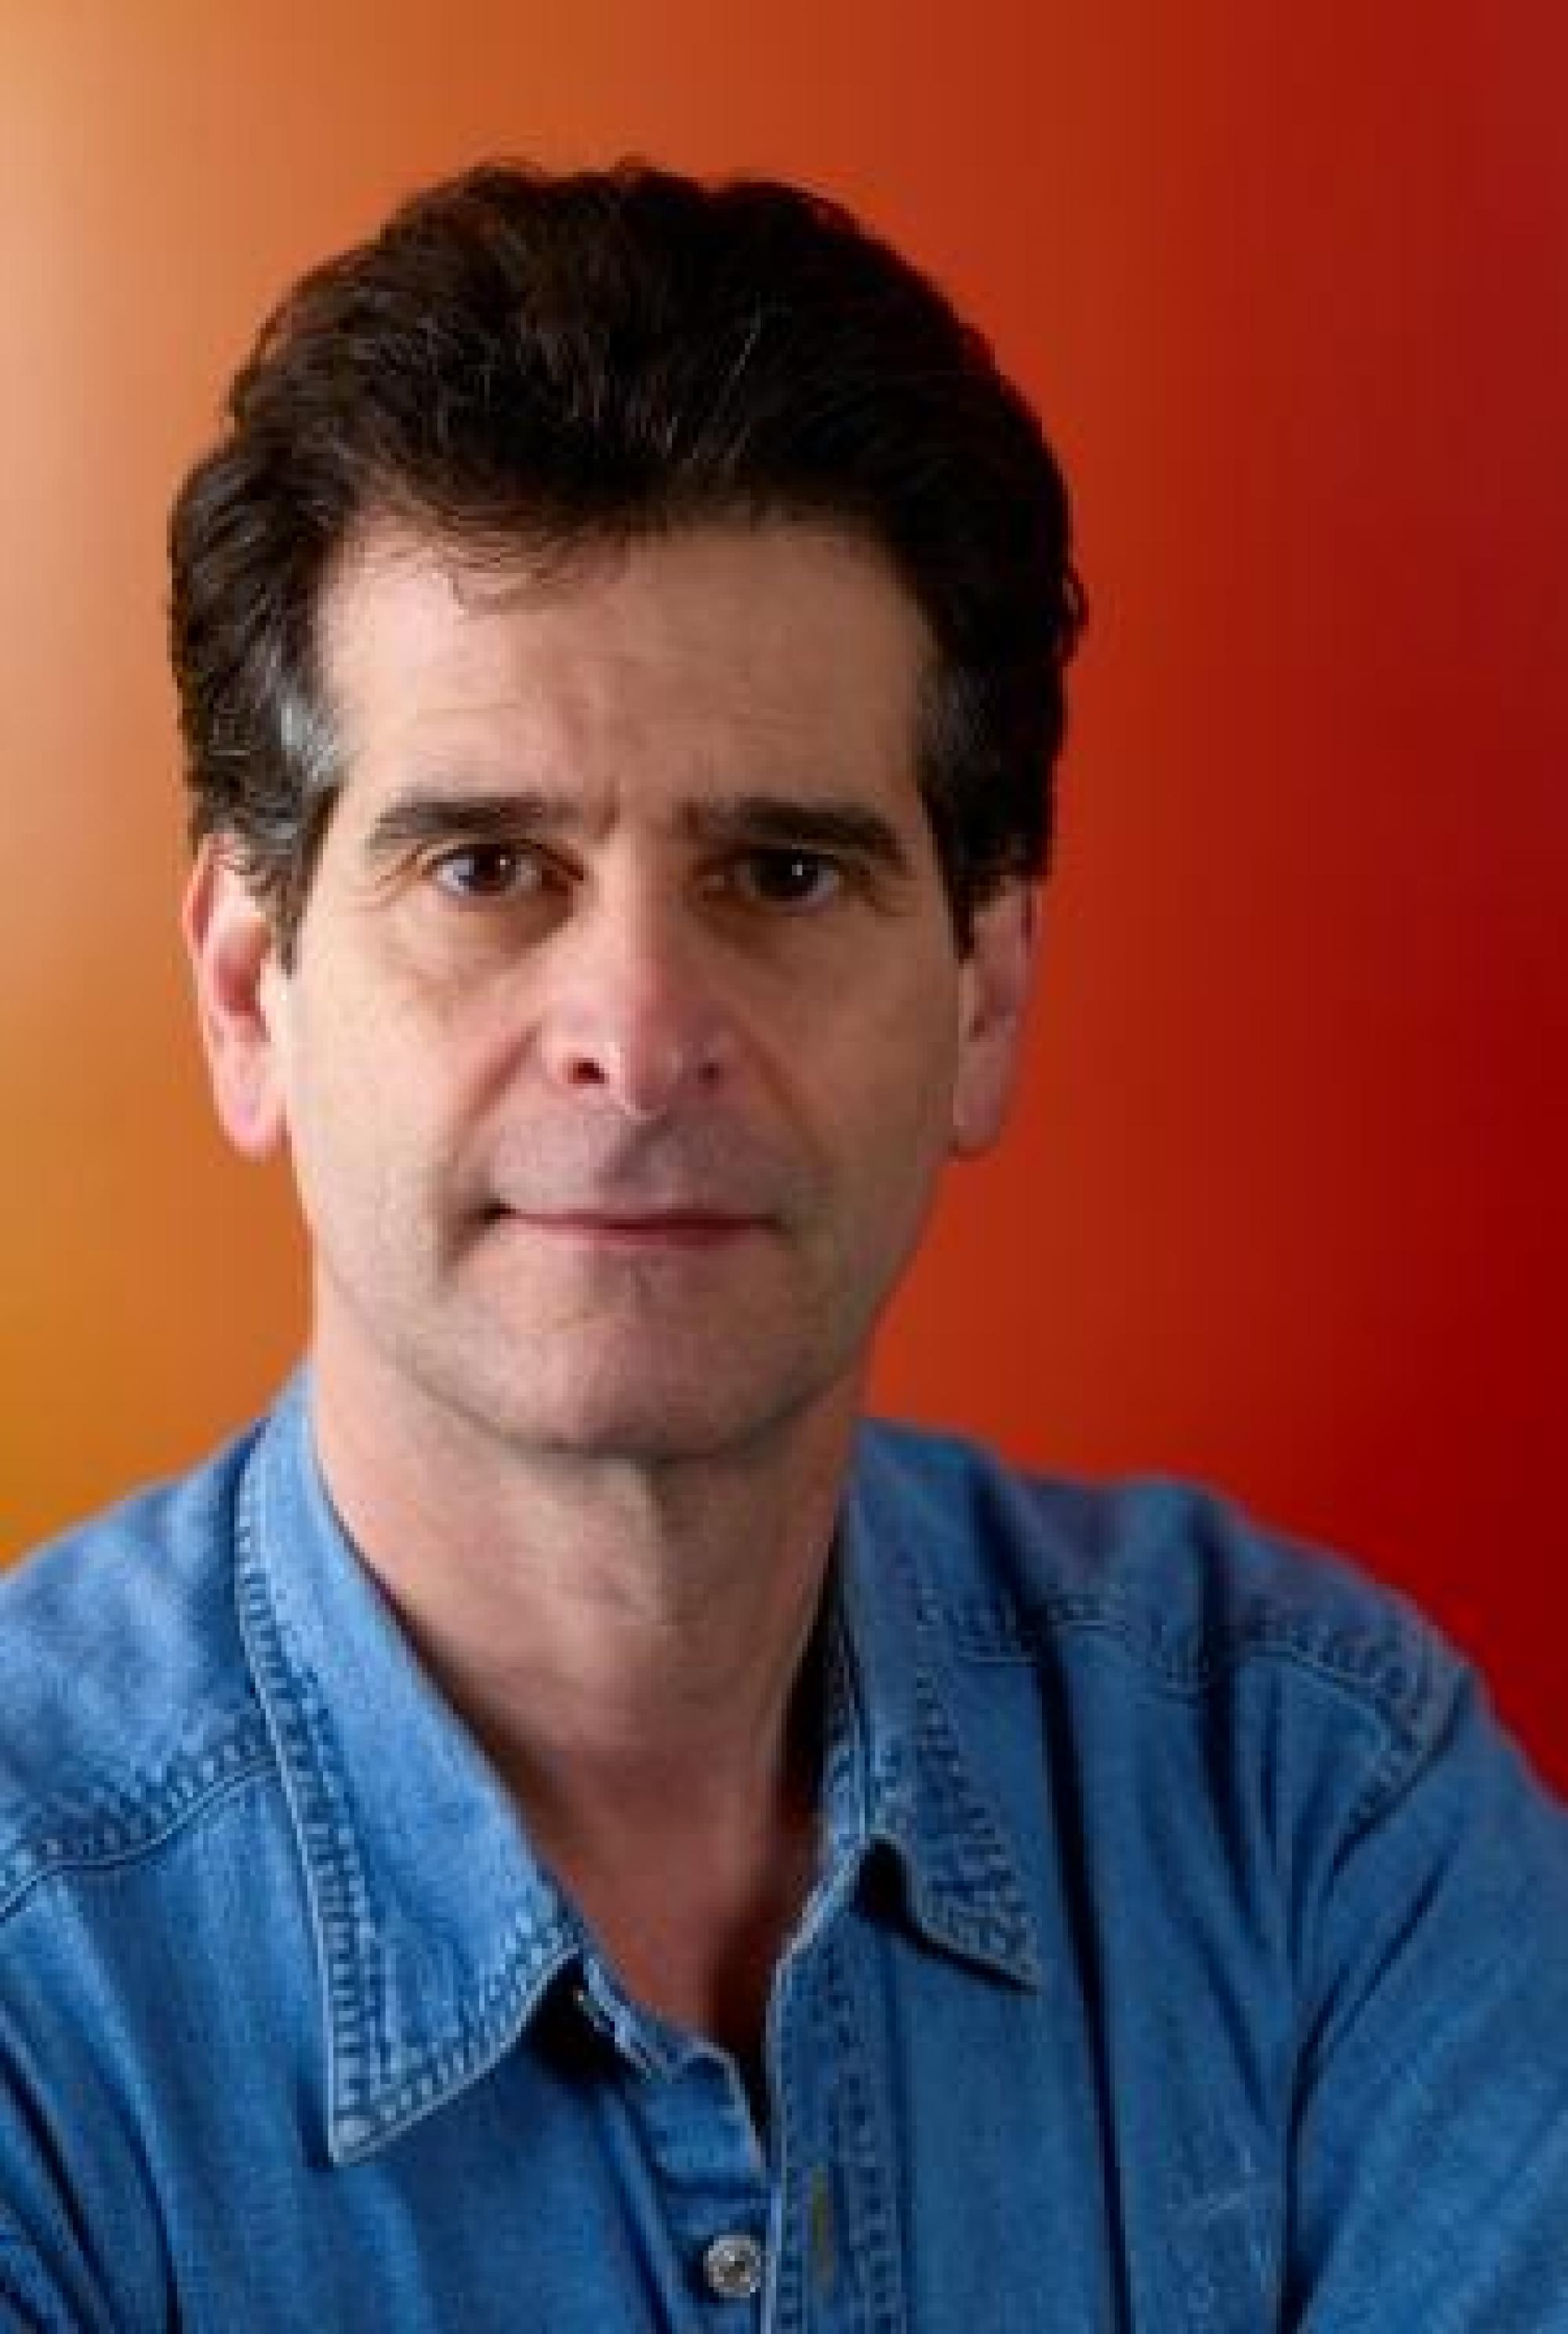 Honorary degree recipient and undergraduate commencement speaker Dean Kamen.